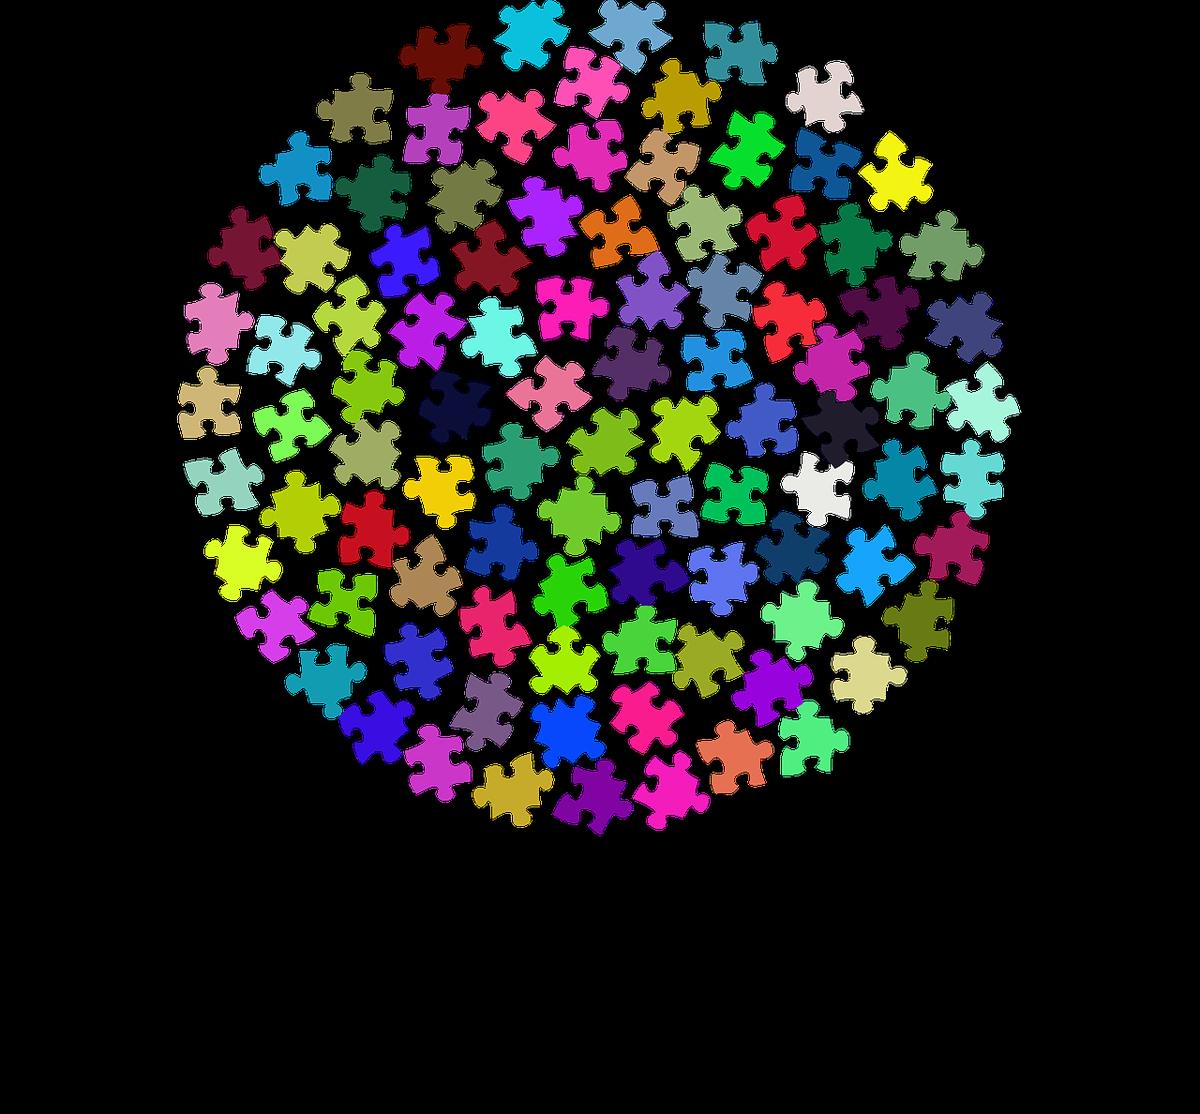 Puzzle clipart problem solving. Eileen gunn on twitter